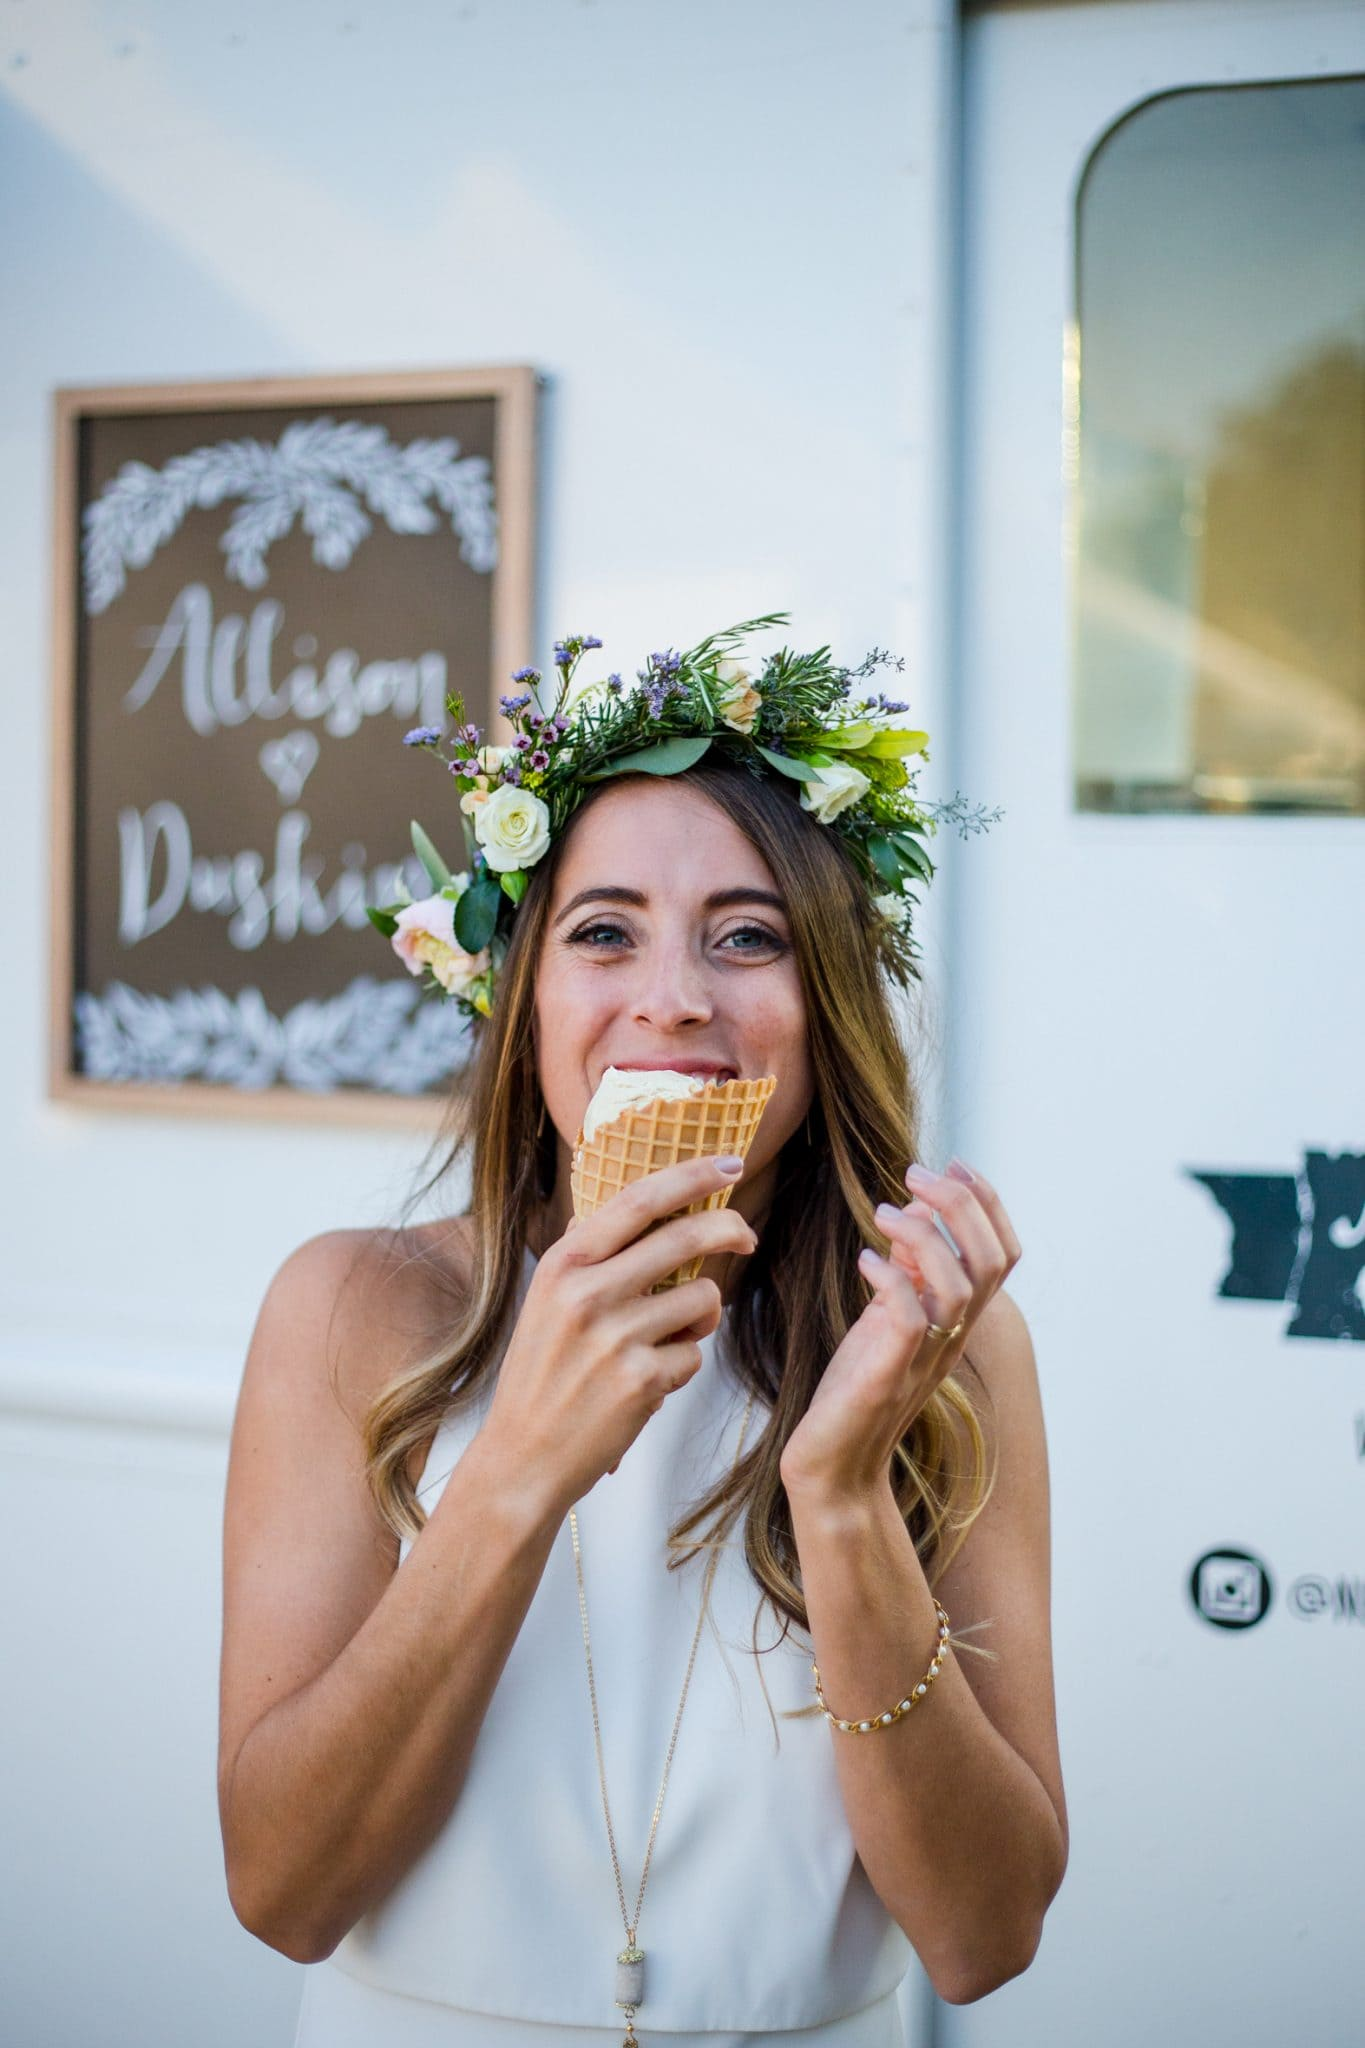 duskin-allison-wedding-740